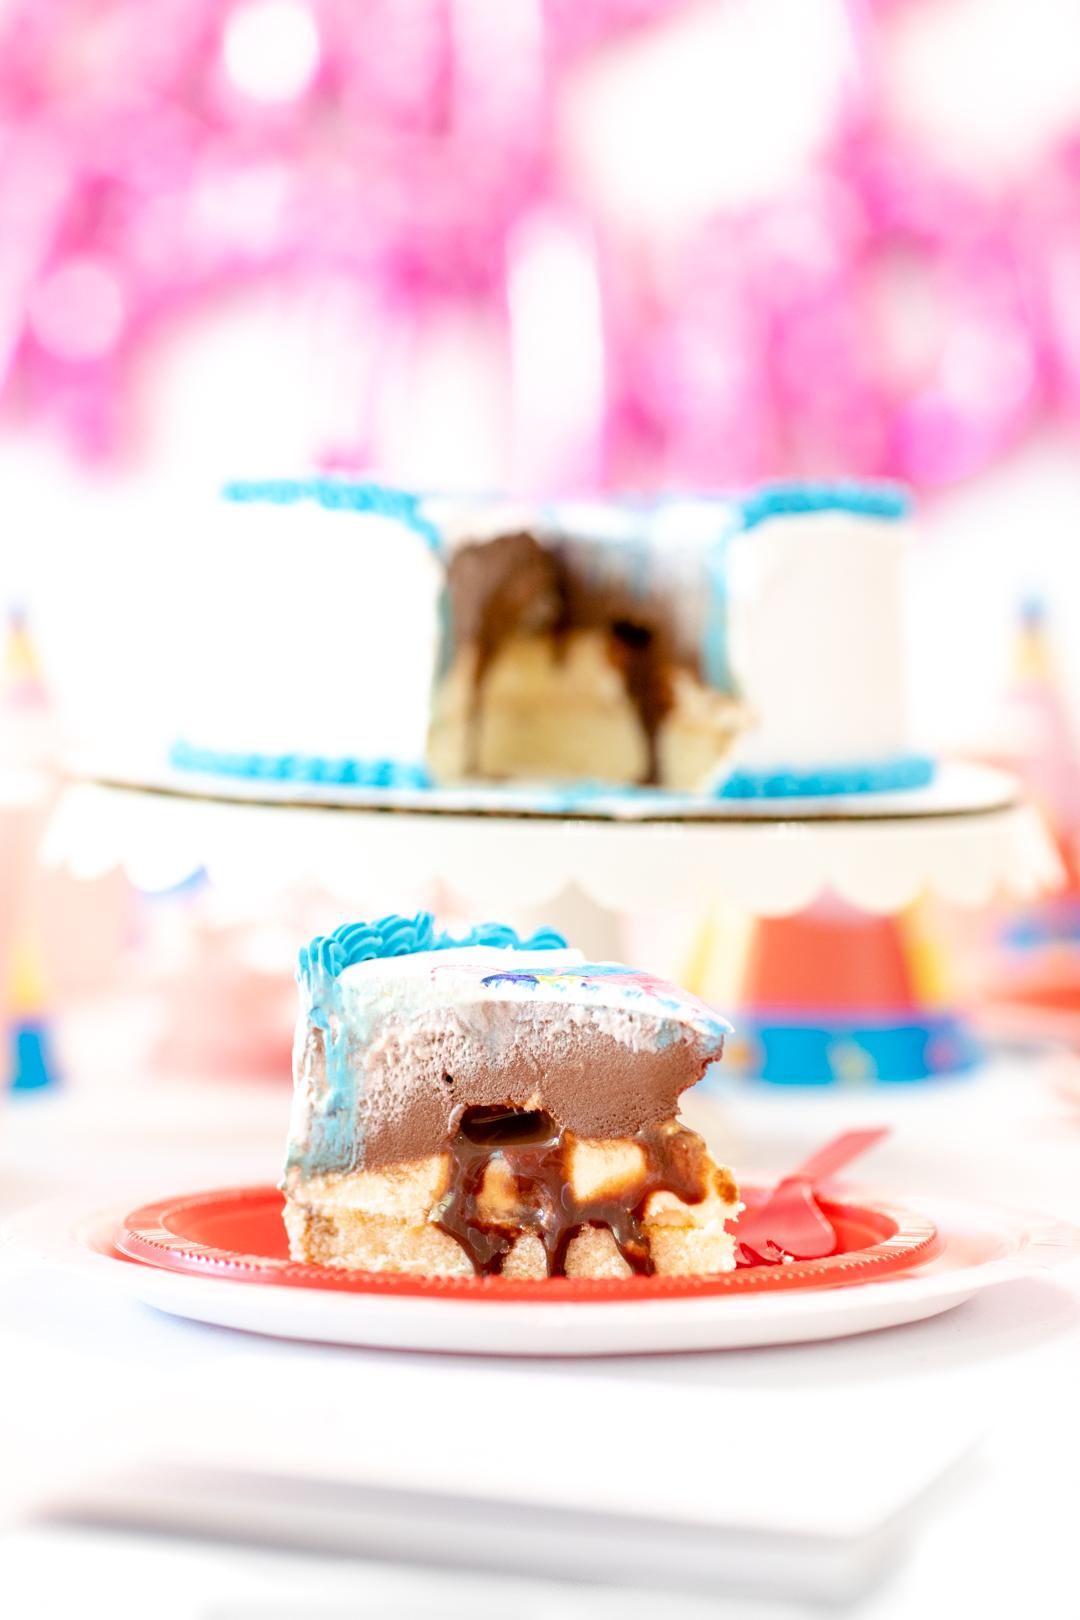 Slice of frozen yogurt cake.